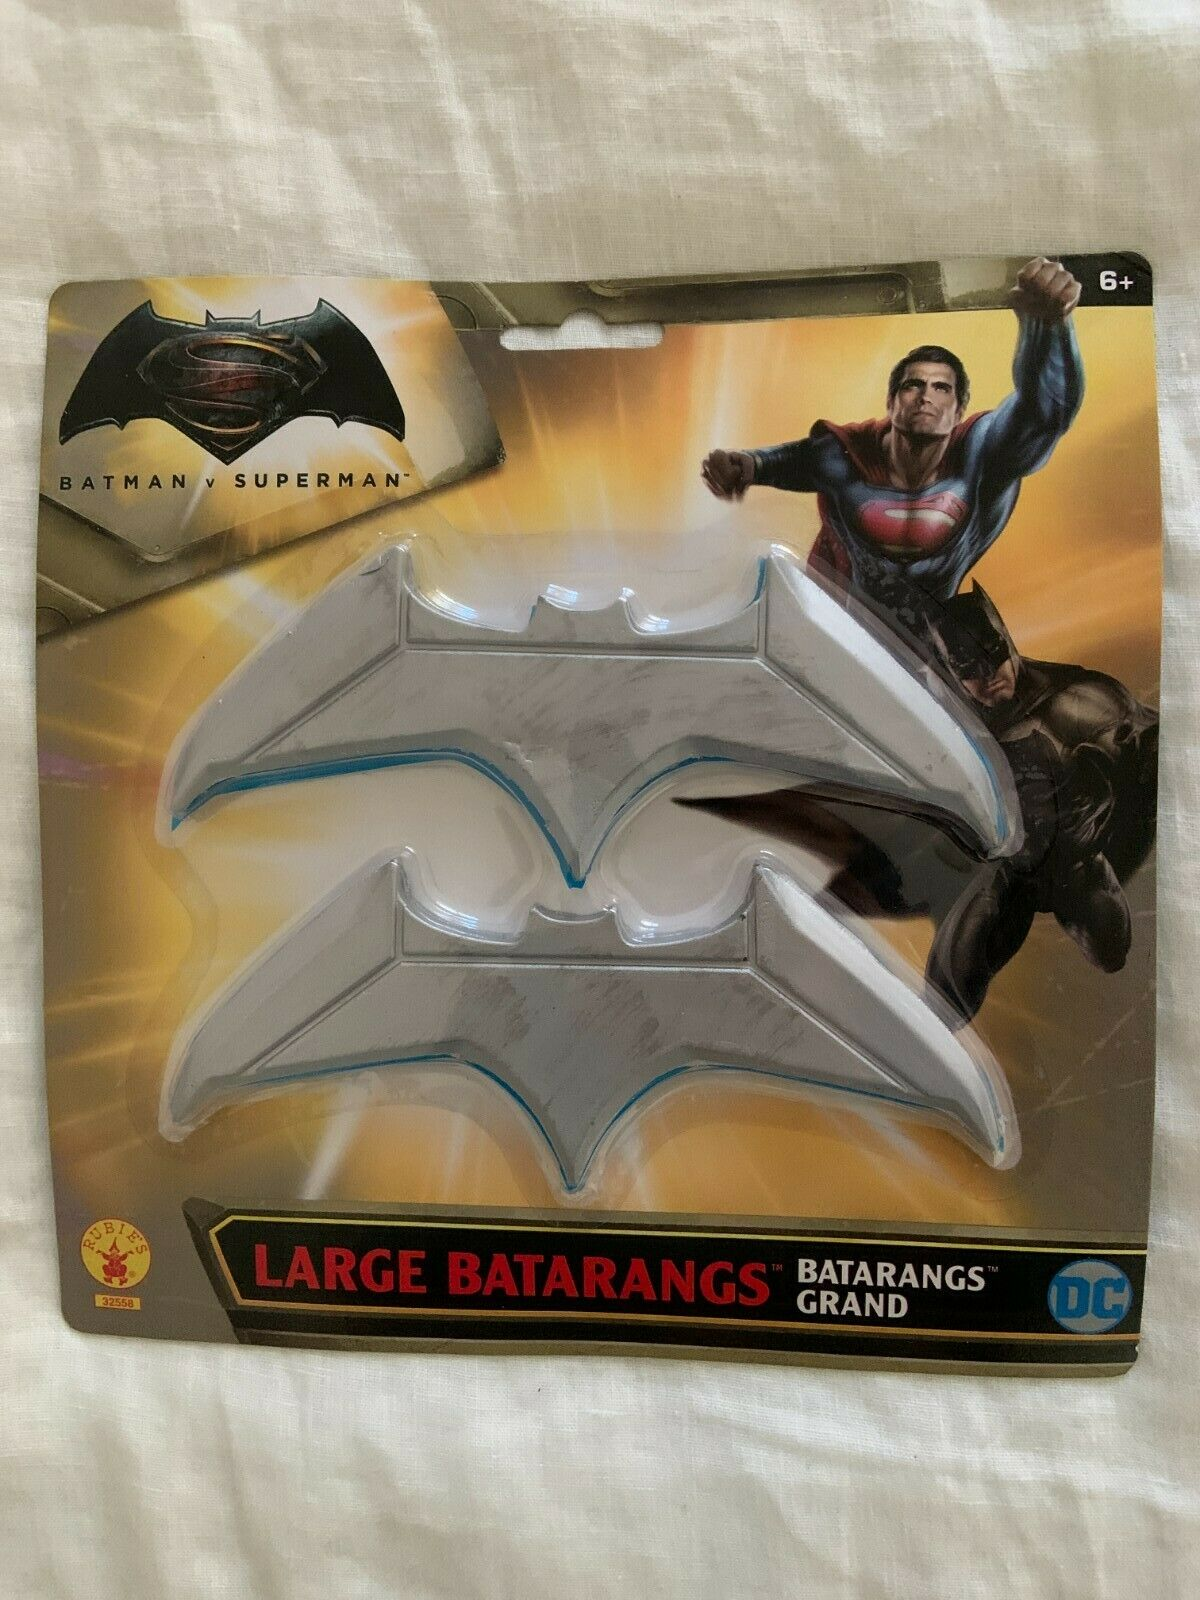 Batman V Superman Dawn of Justice League batarangs les chauves-souris Costume Prop Cosplay